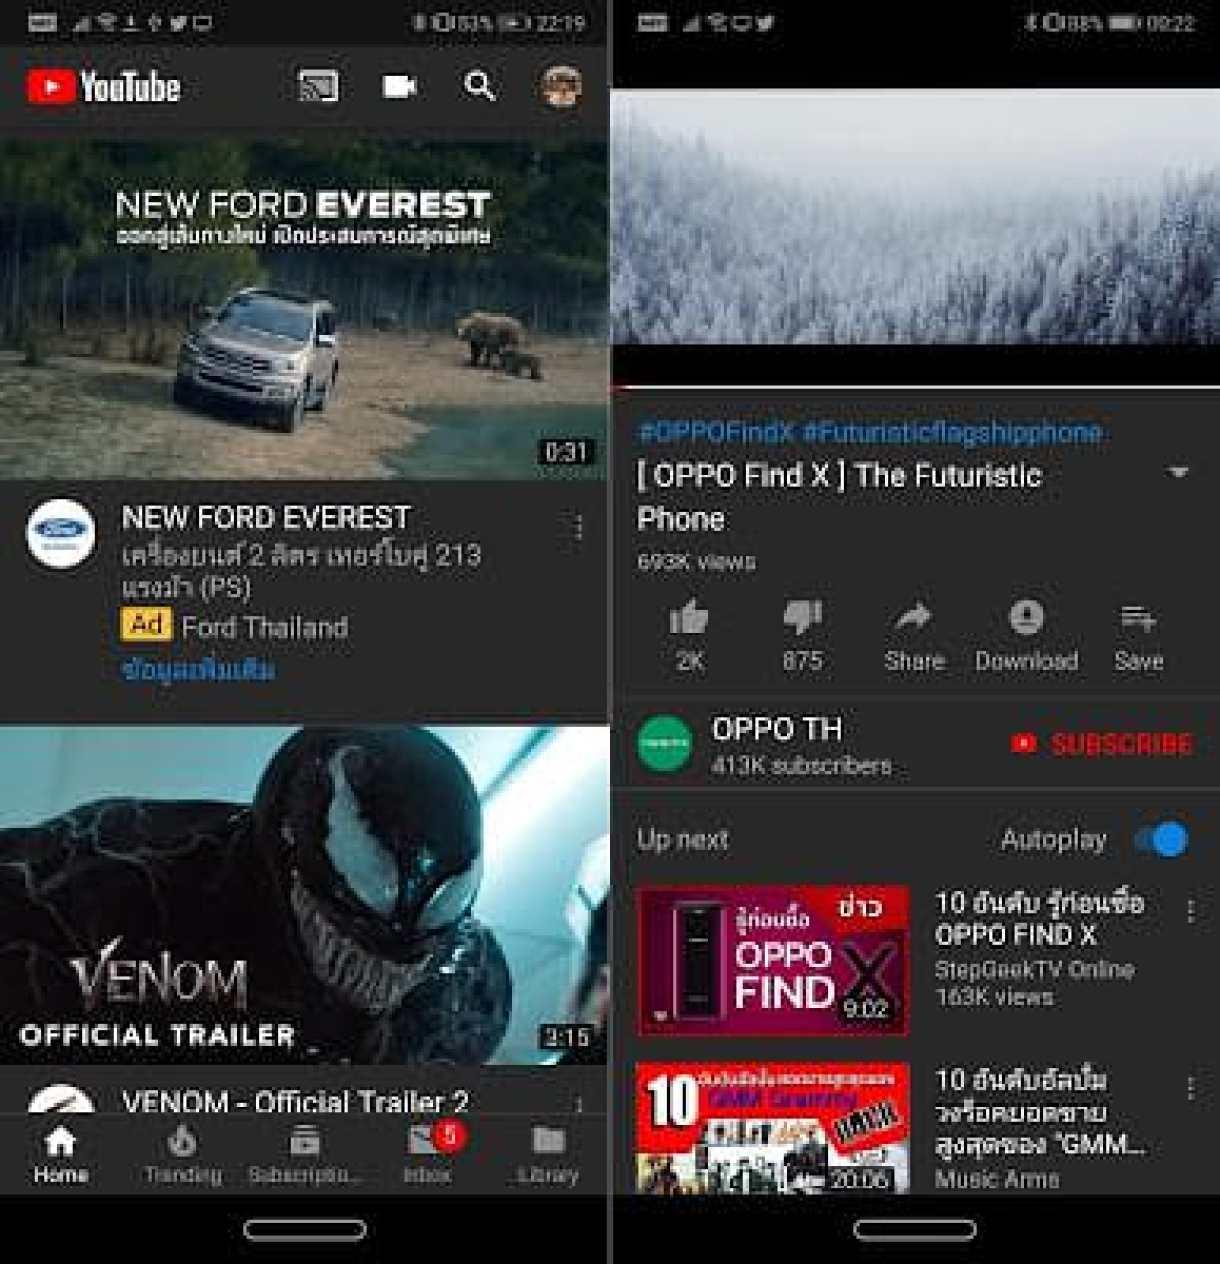 - Screenshot 20180731 22191228129 side 1 - วิธีเปลี่ยน YouTube ให้เป็นสีดำโดยไม่ต้องรอ Google